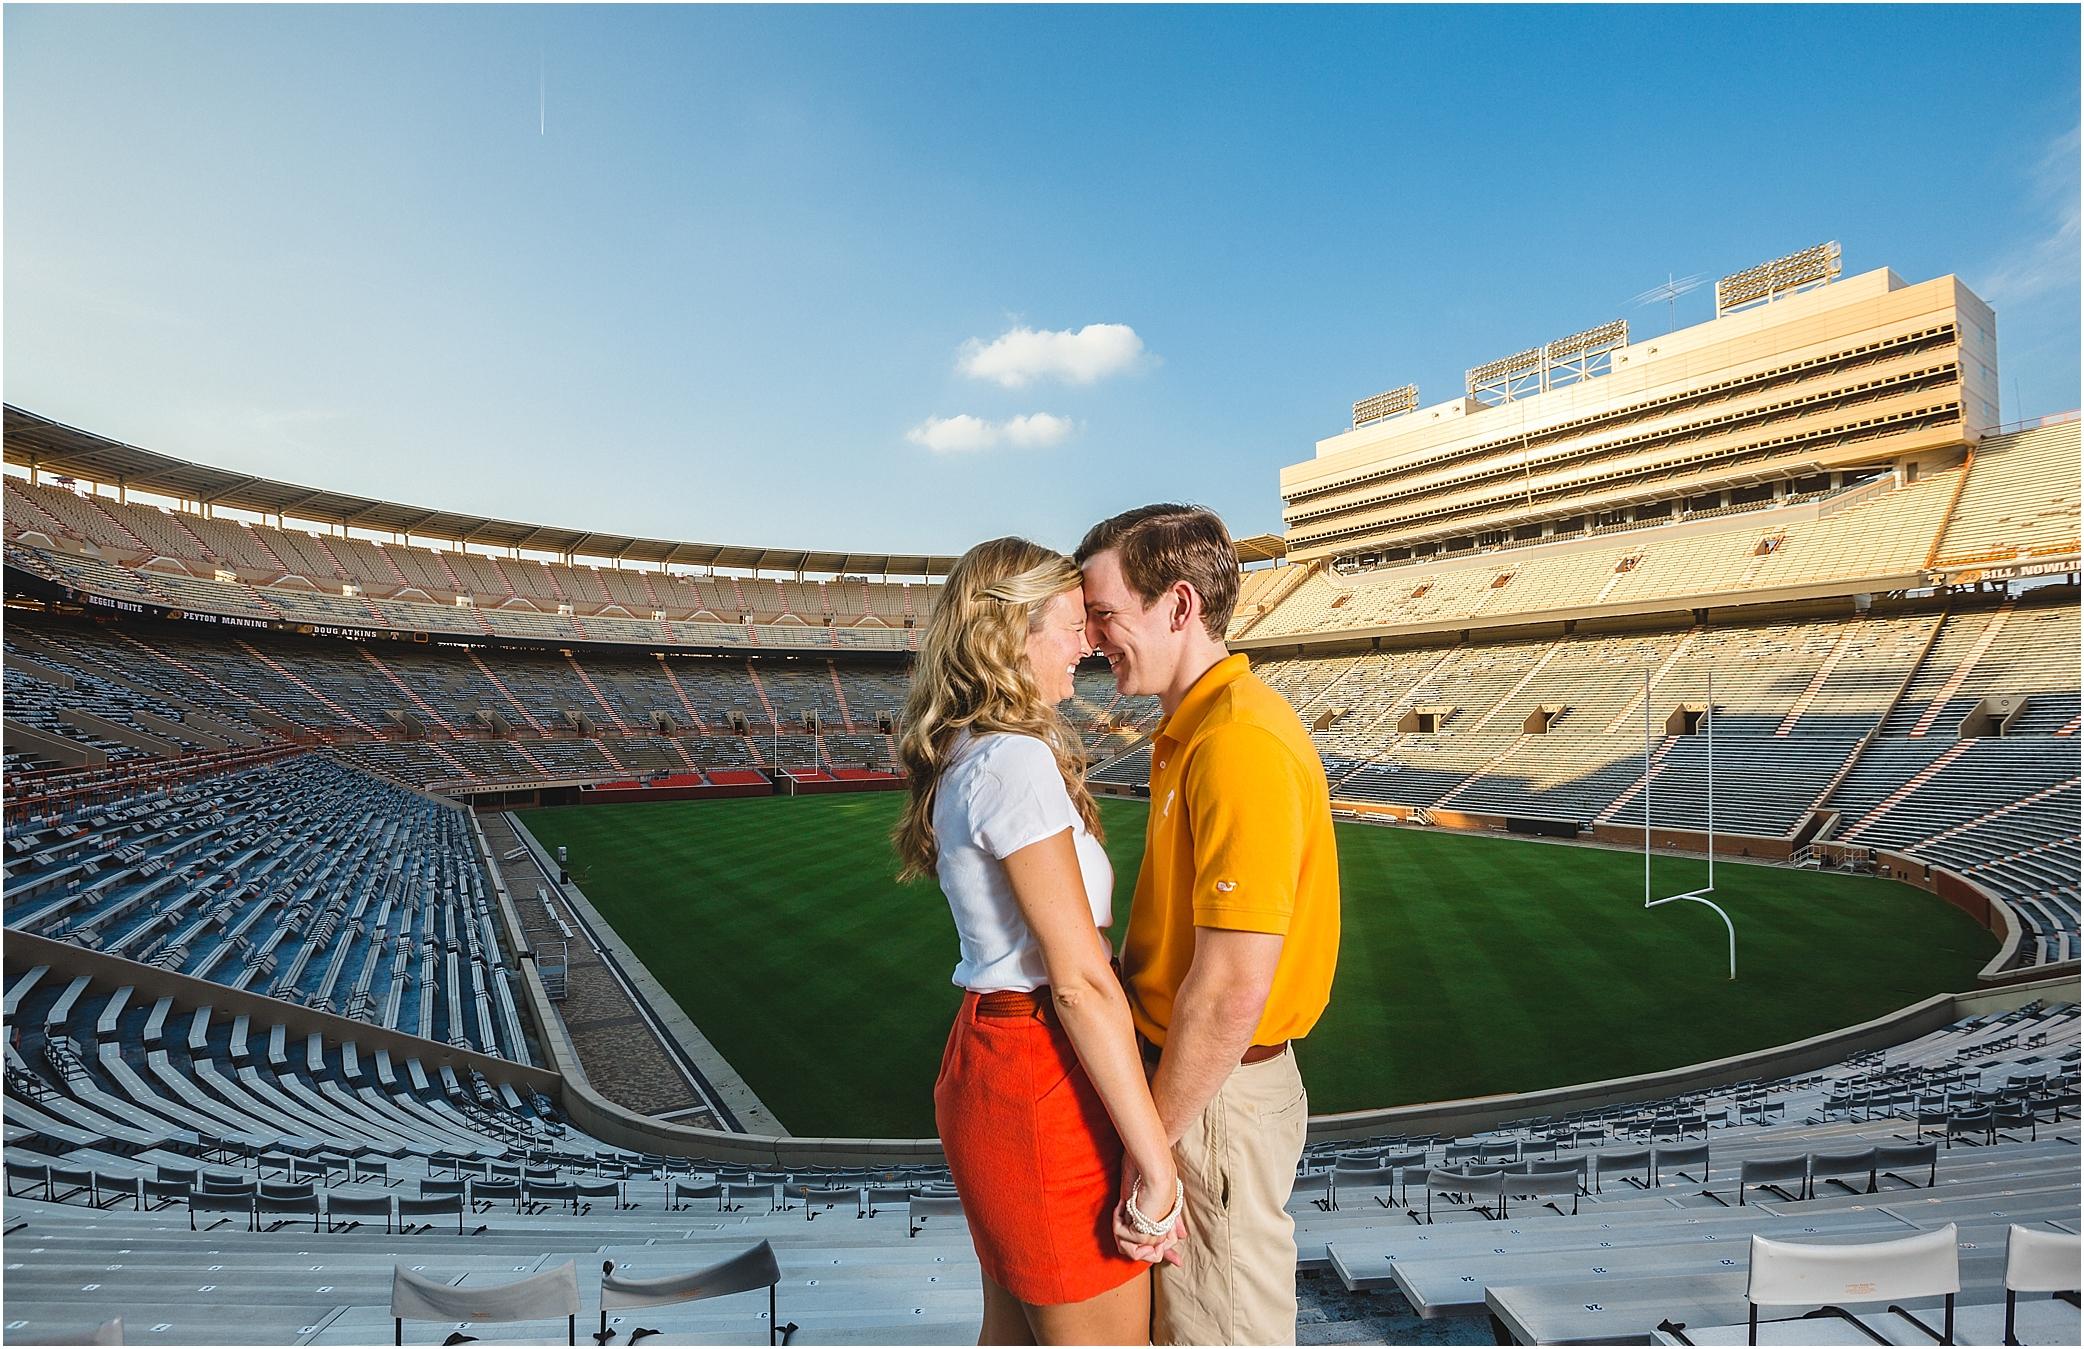 Tennessee online casino guide: casino offers - howtobet4free.com Vols Neyland Stadium